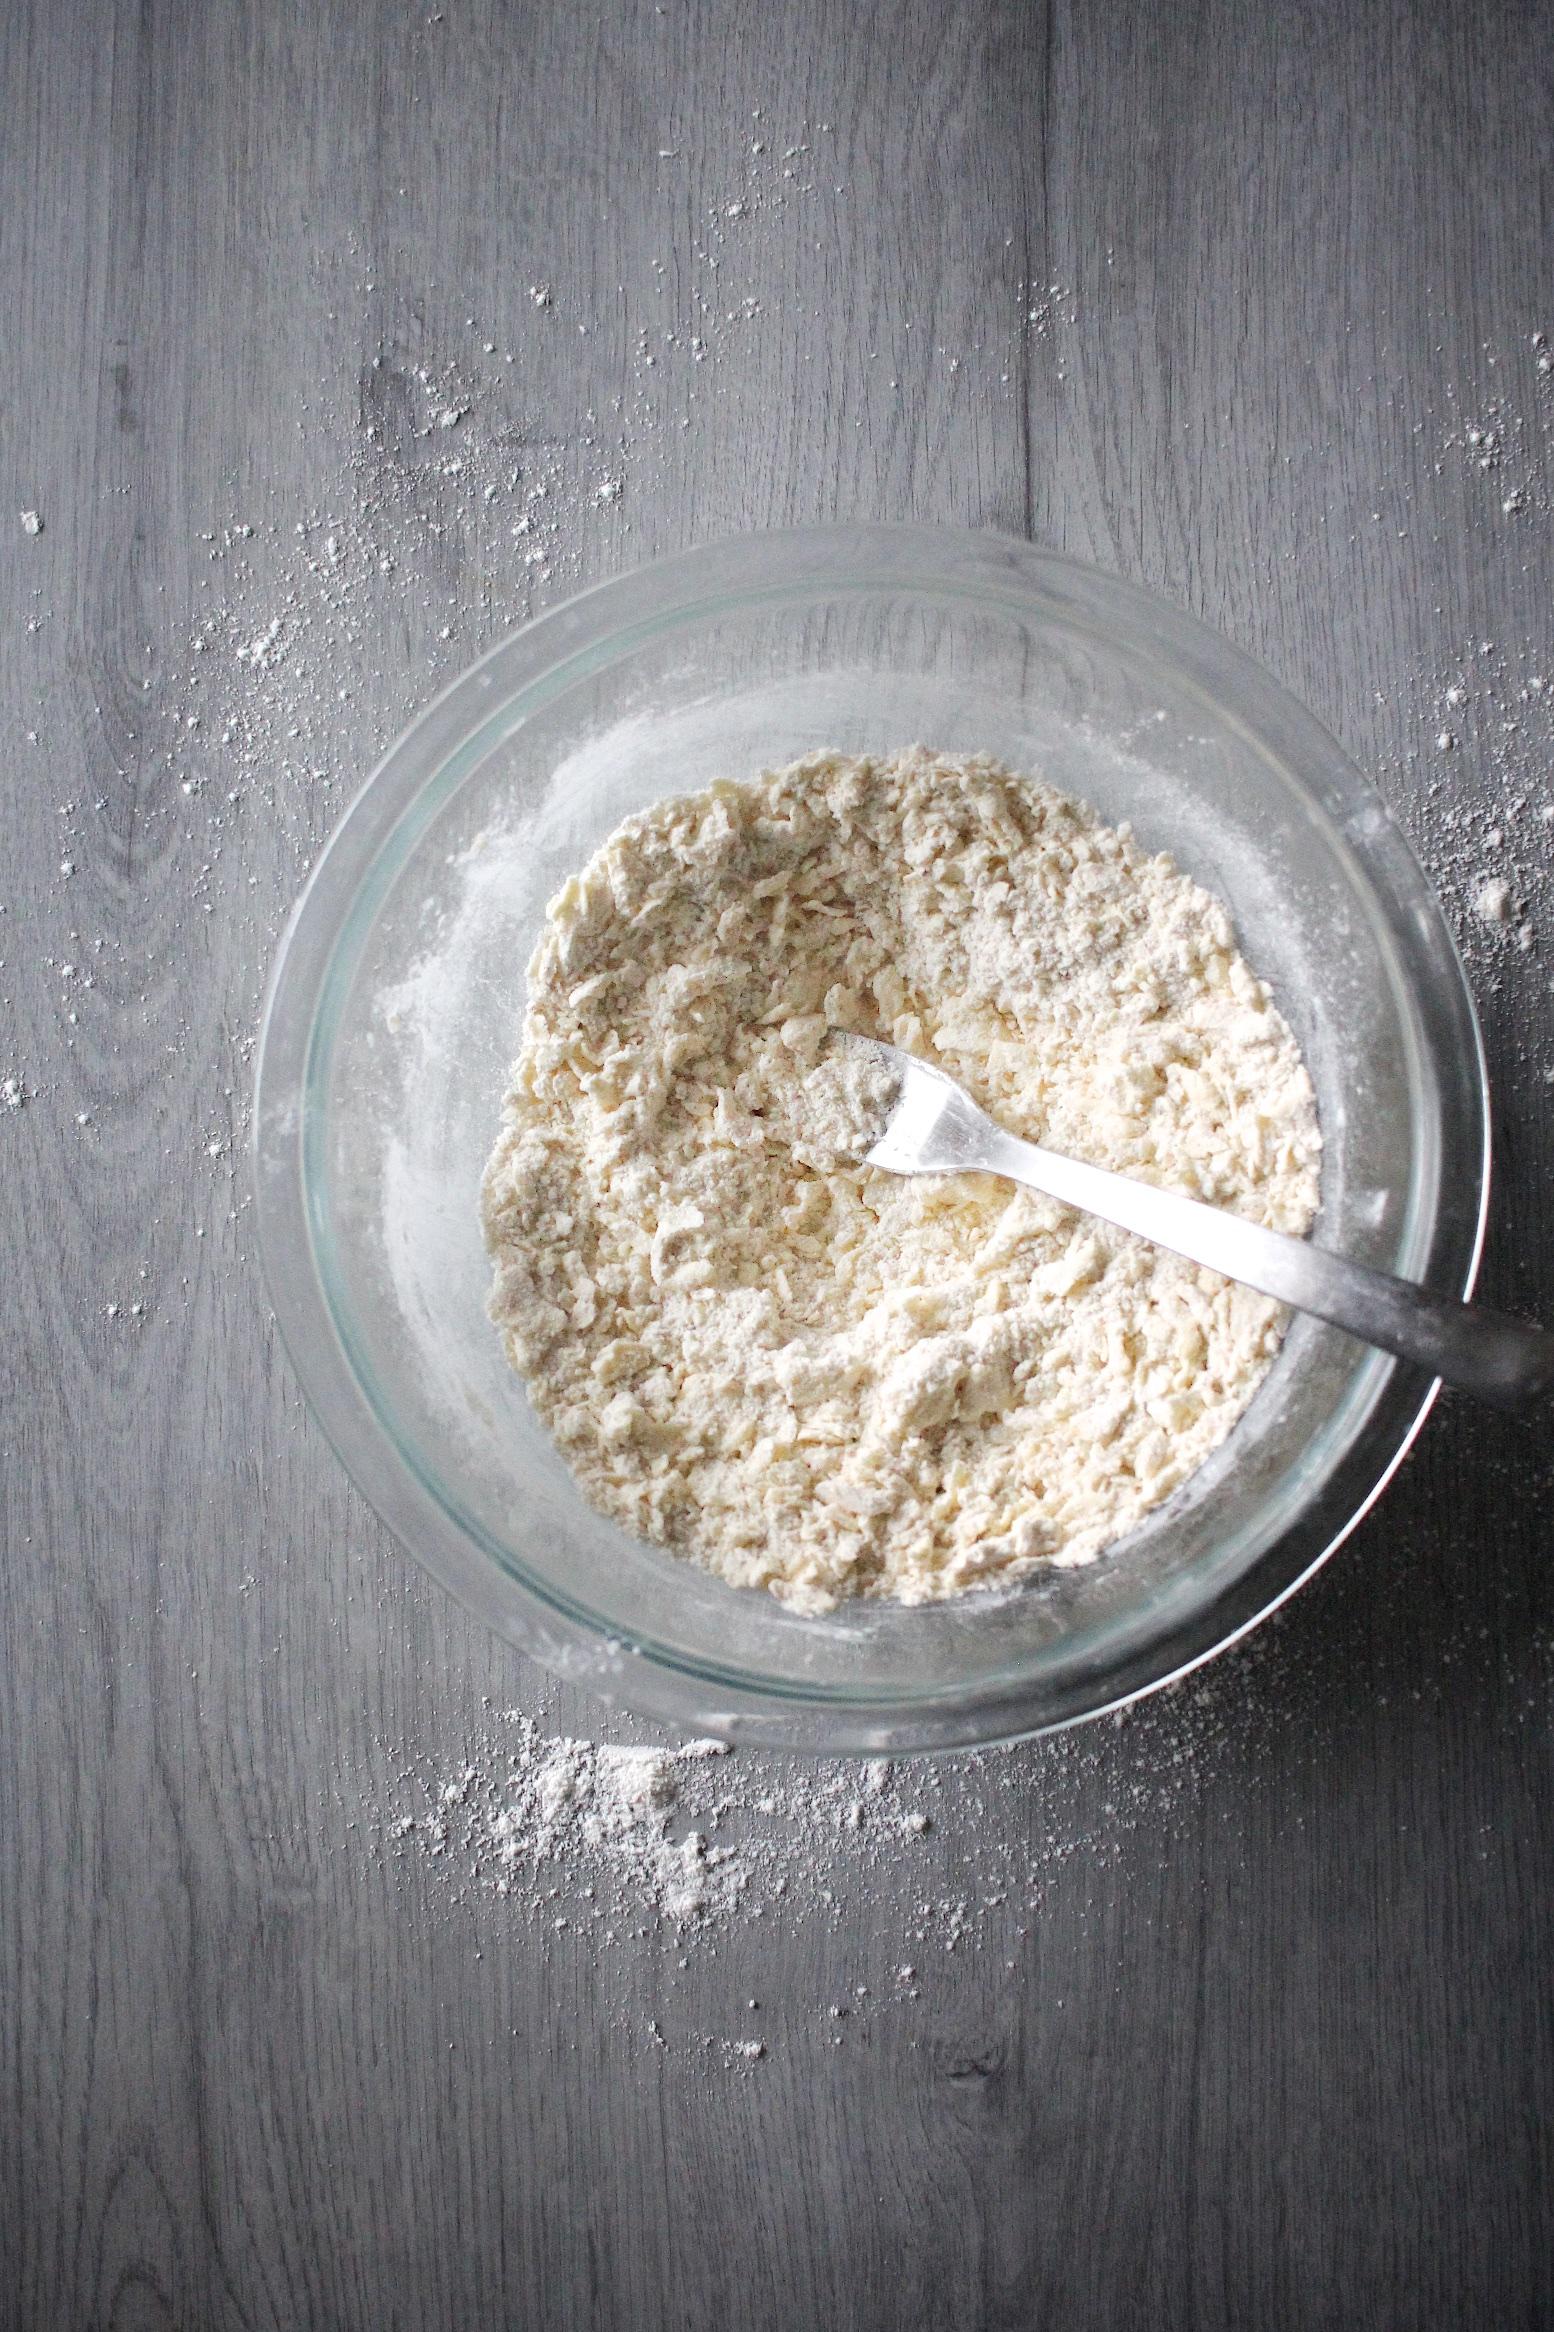 Easy Pie Crust from Scratch